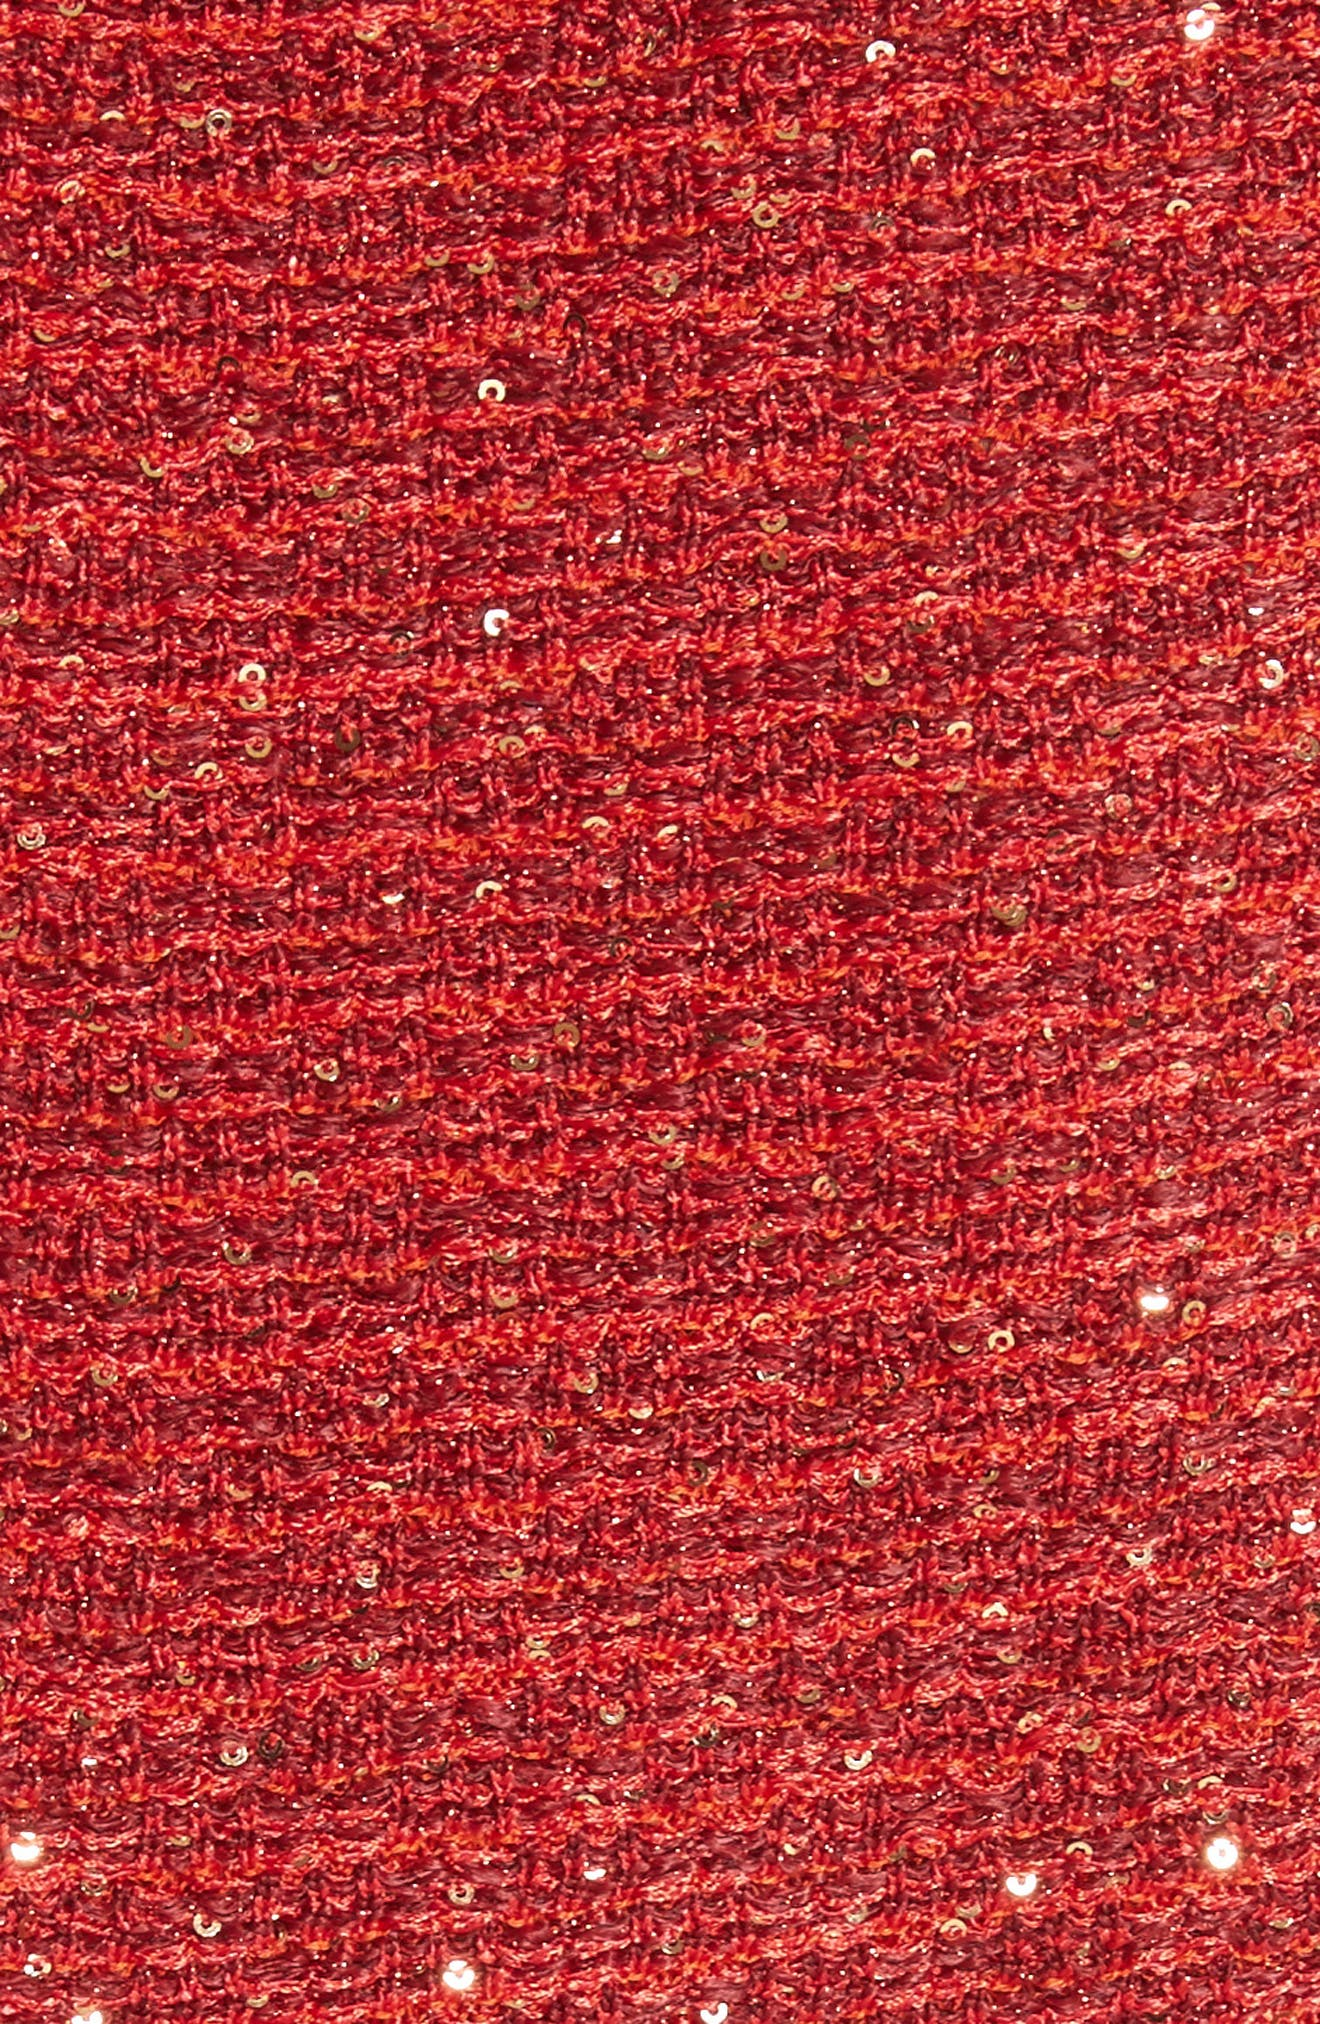 Glamour Sequin Knit Sheath Dress,                             Alternate thumbnail 6, color,                             SIENNA MULTI